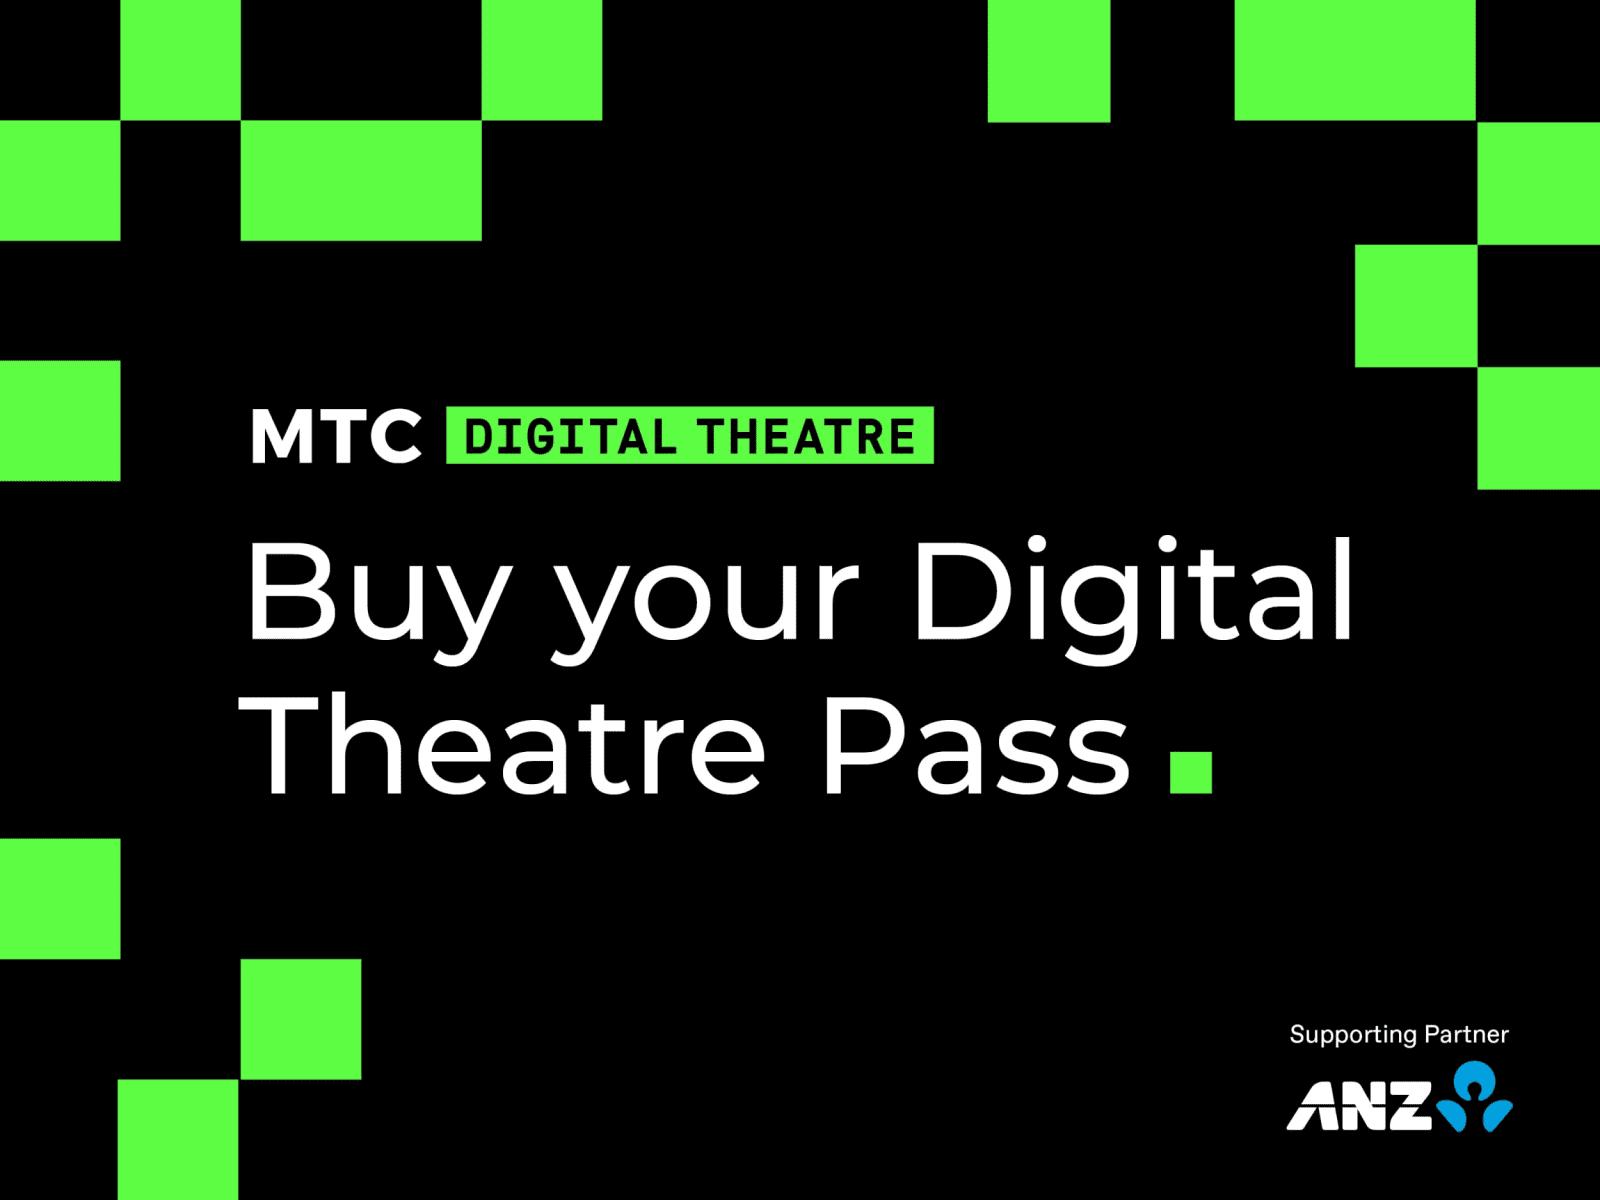 Artwork for Discounted MTC Digital Theatre Passes